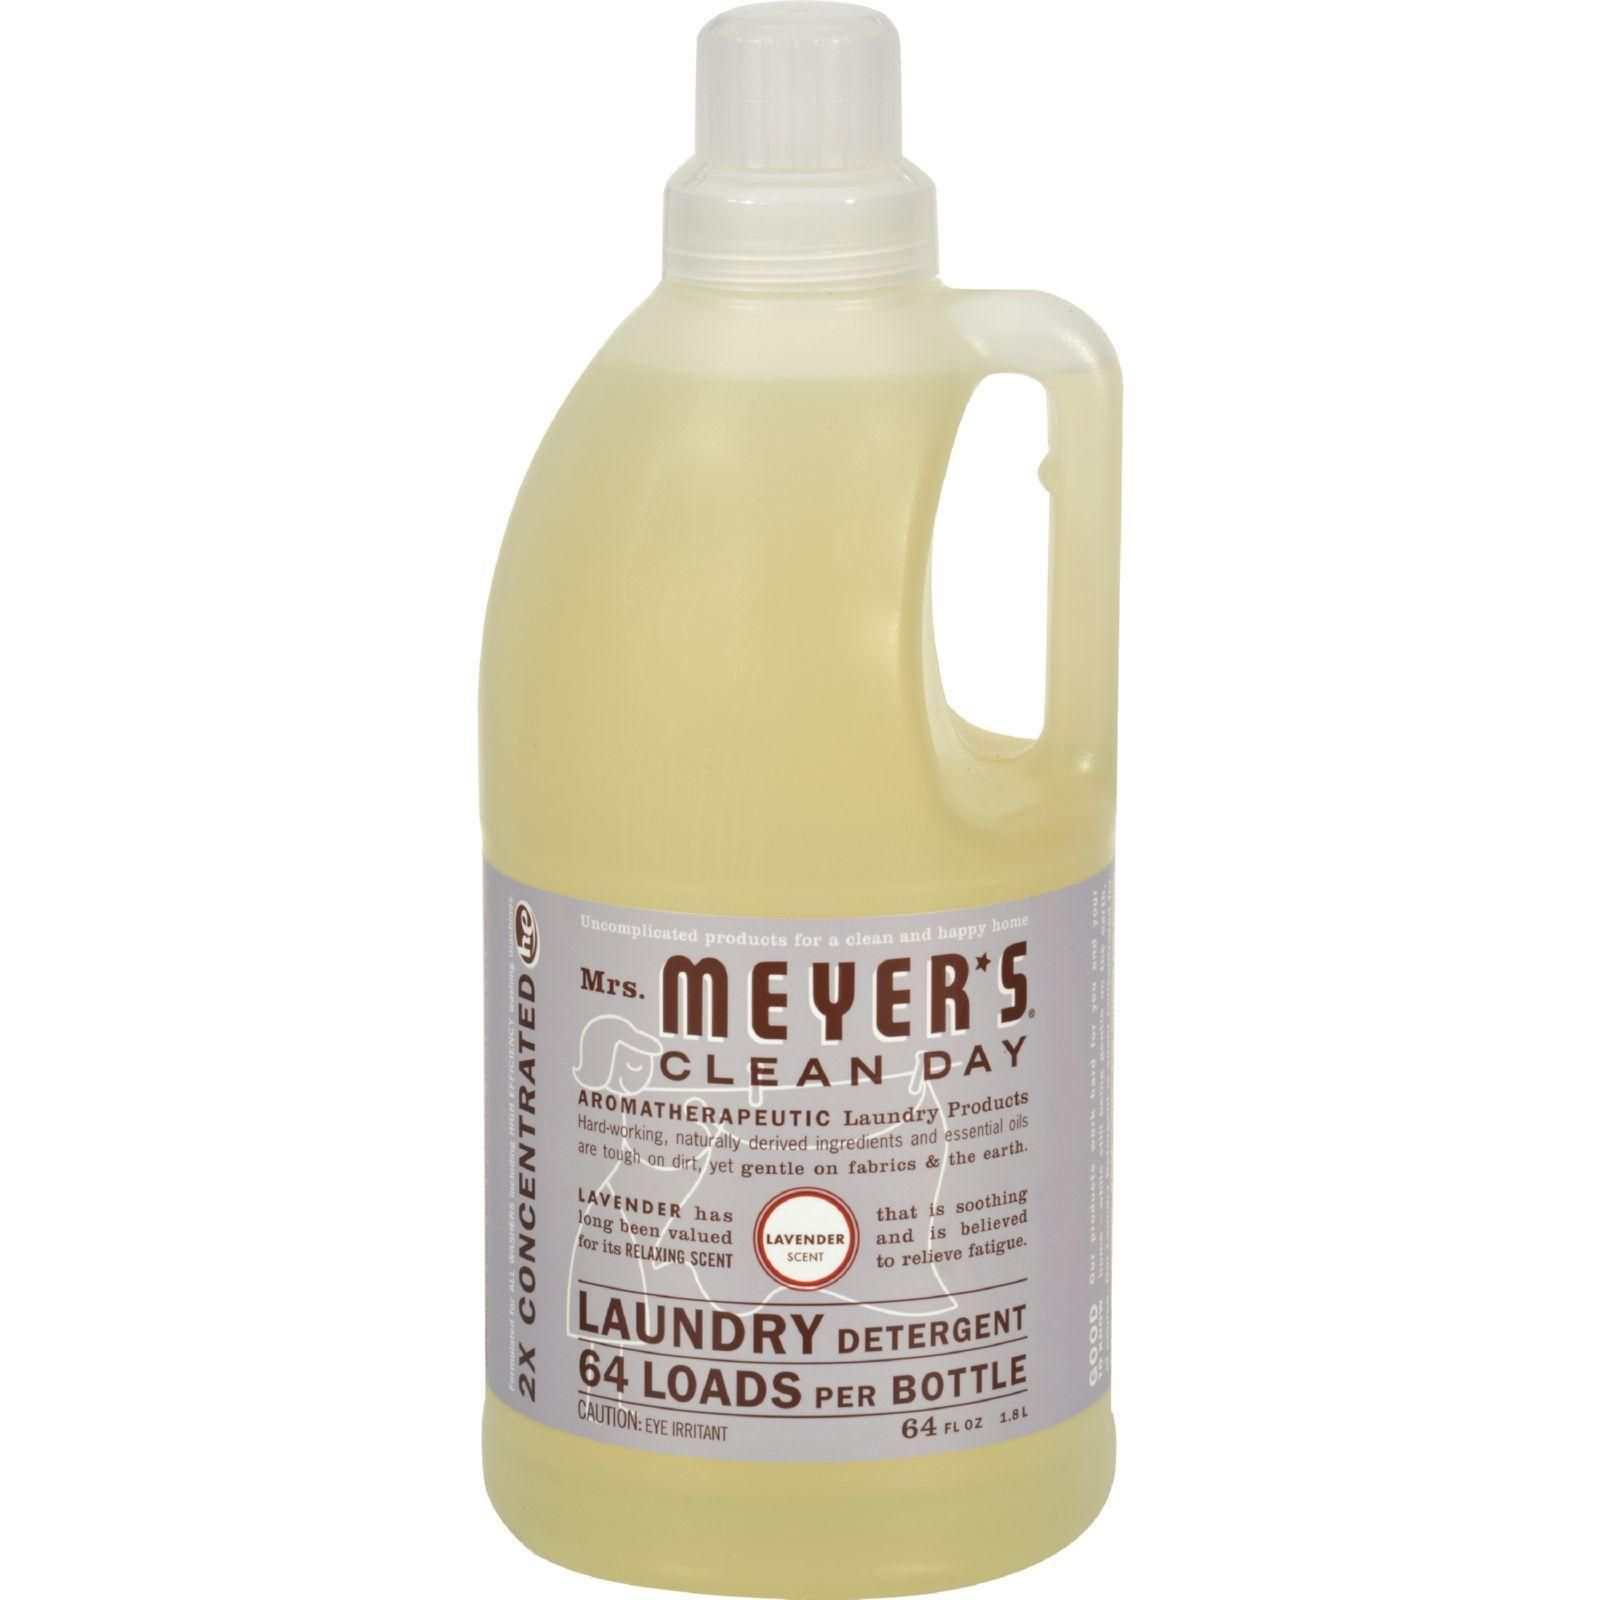 Mrs Meyer S 2x Laundry Detergent Lavender 64 Oz Laundry Detergent Cleaning Day Natural Laundry Detergent